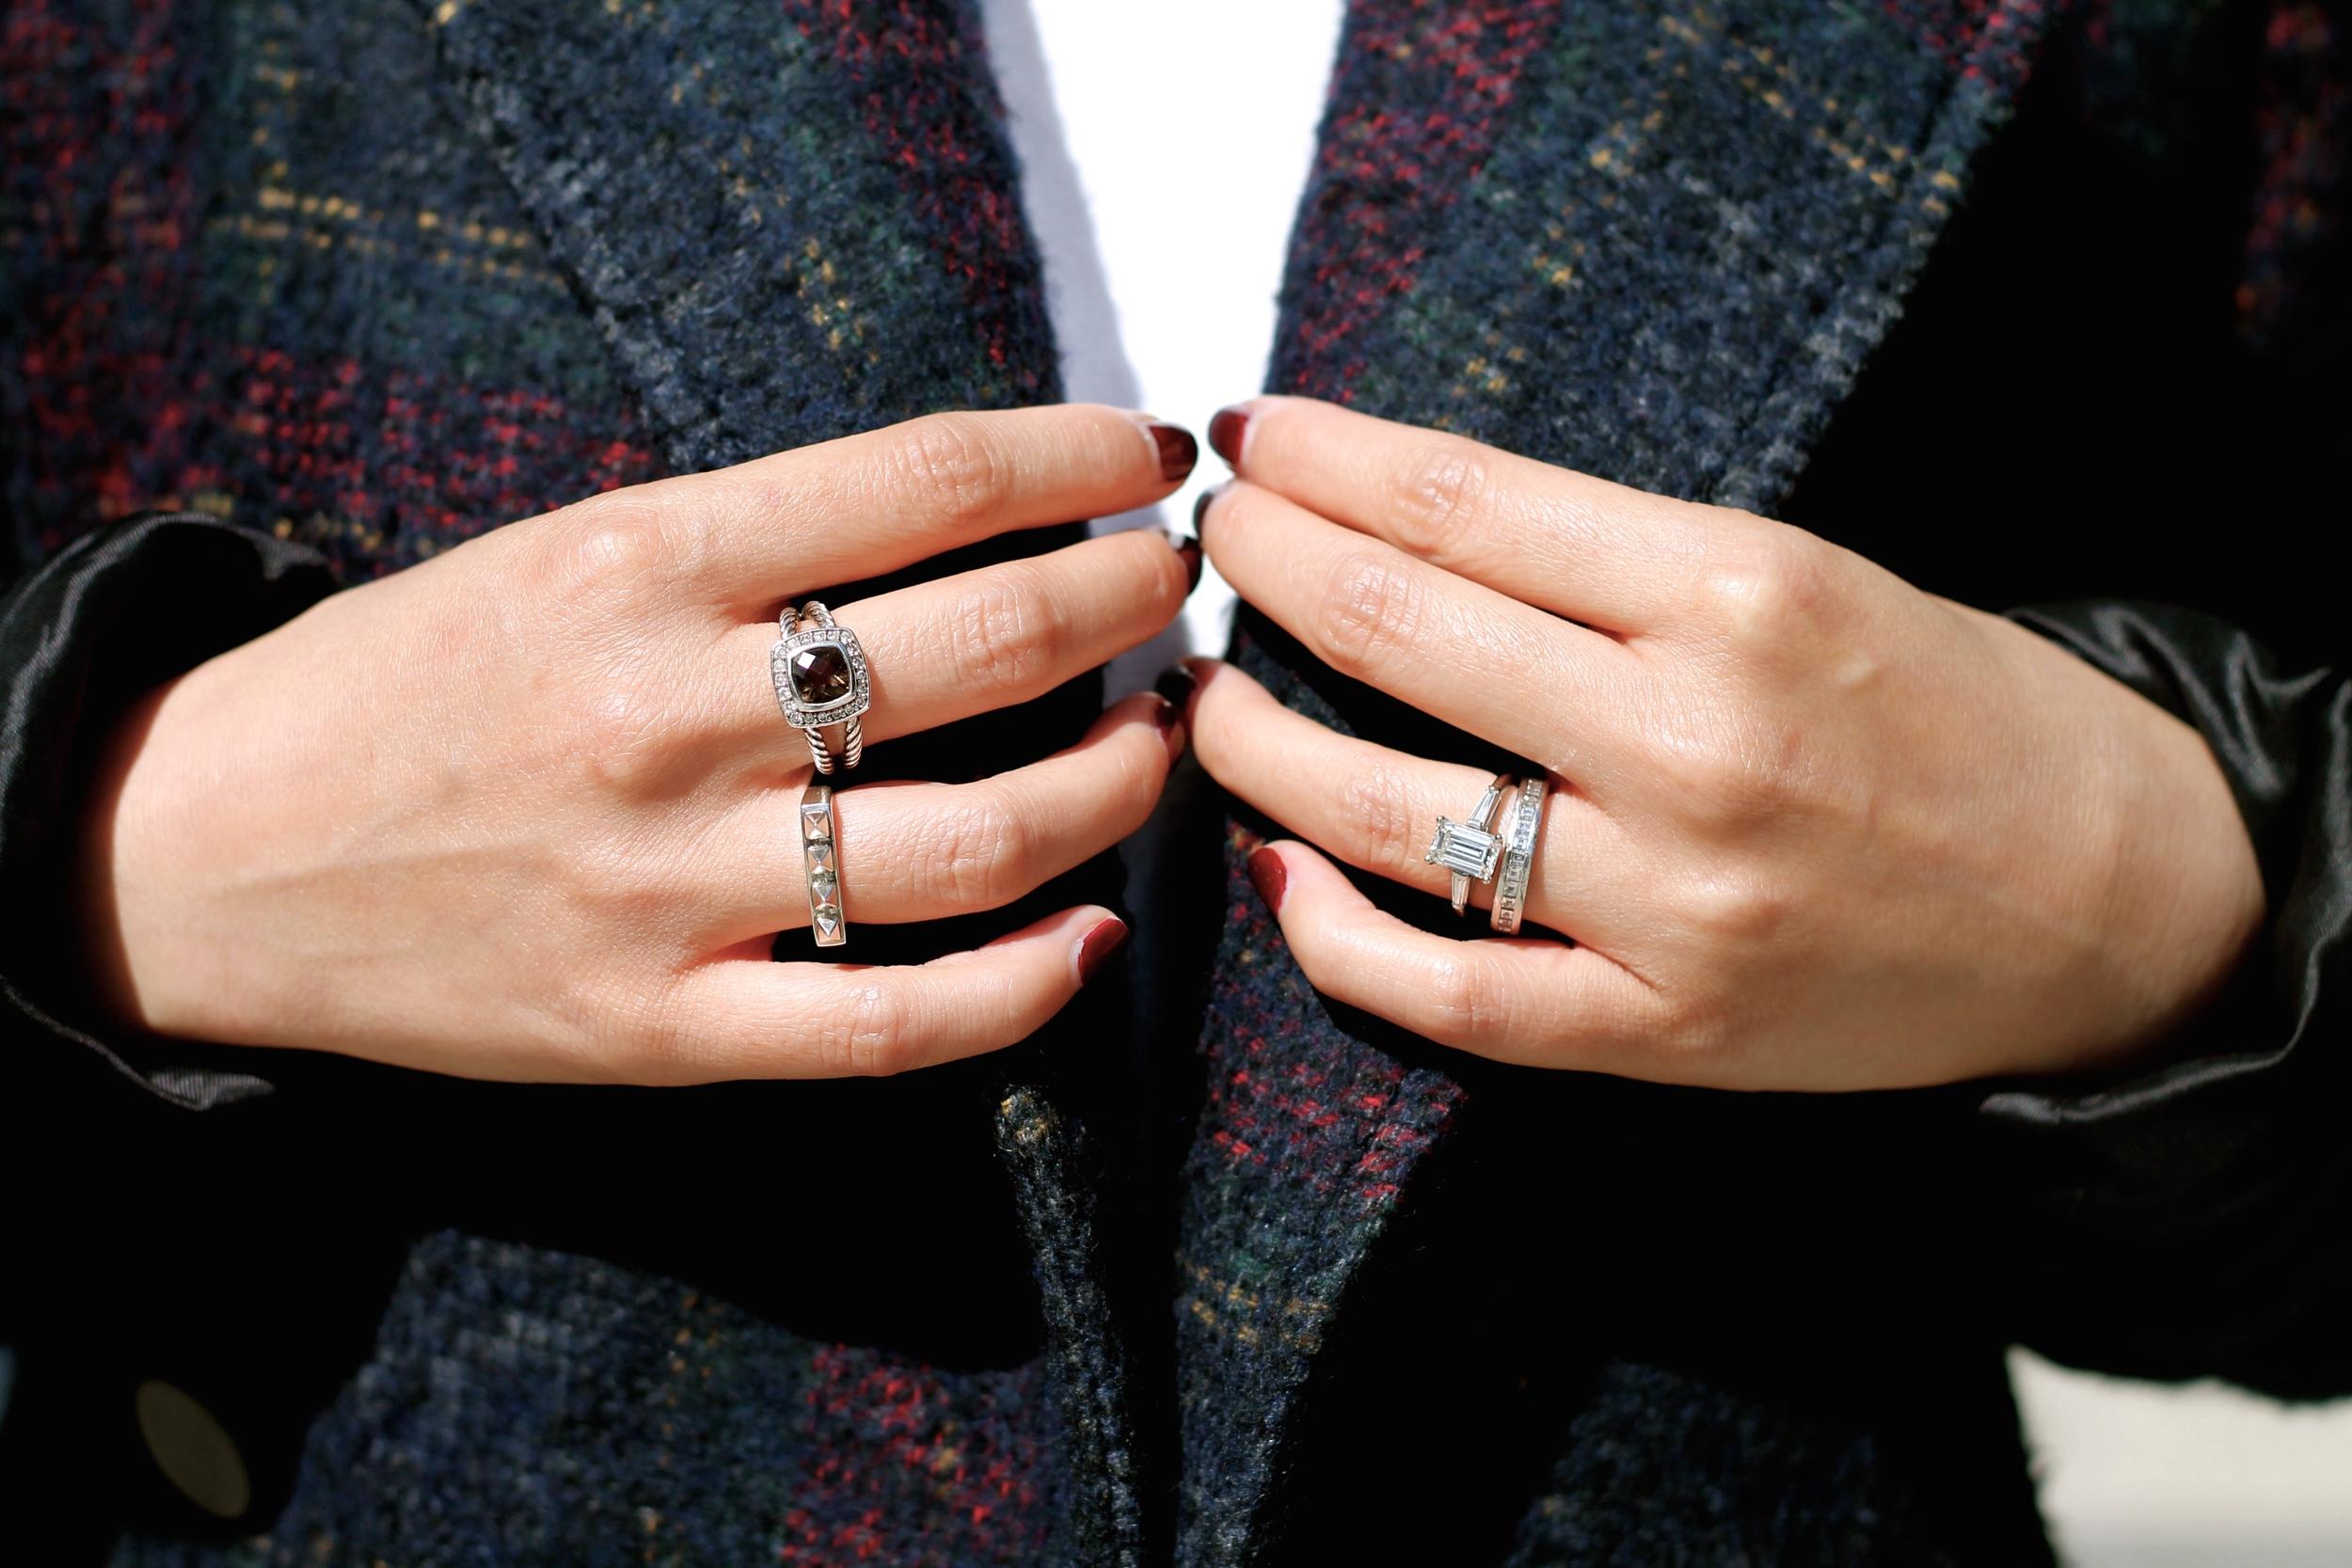 David Yurman, Svelte Metals and my own rings